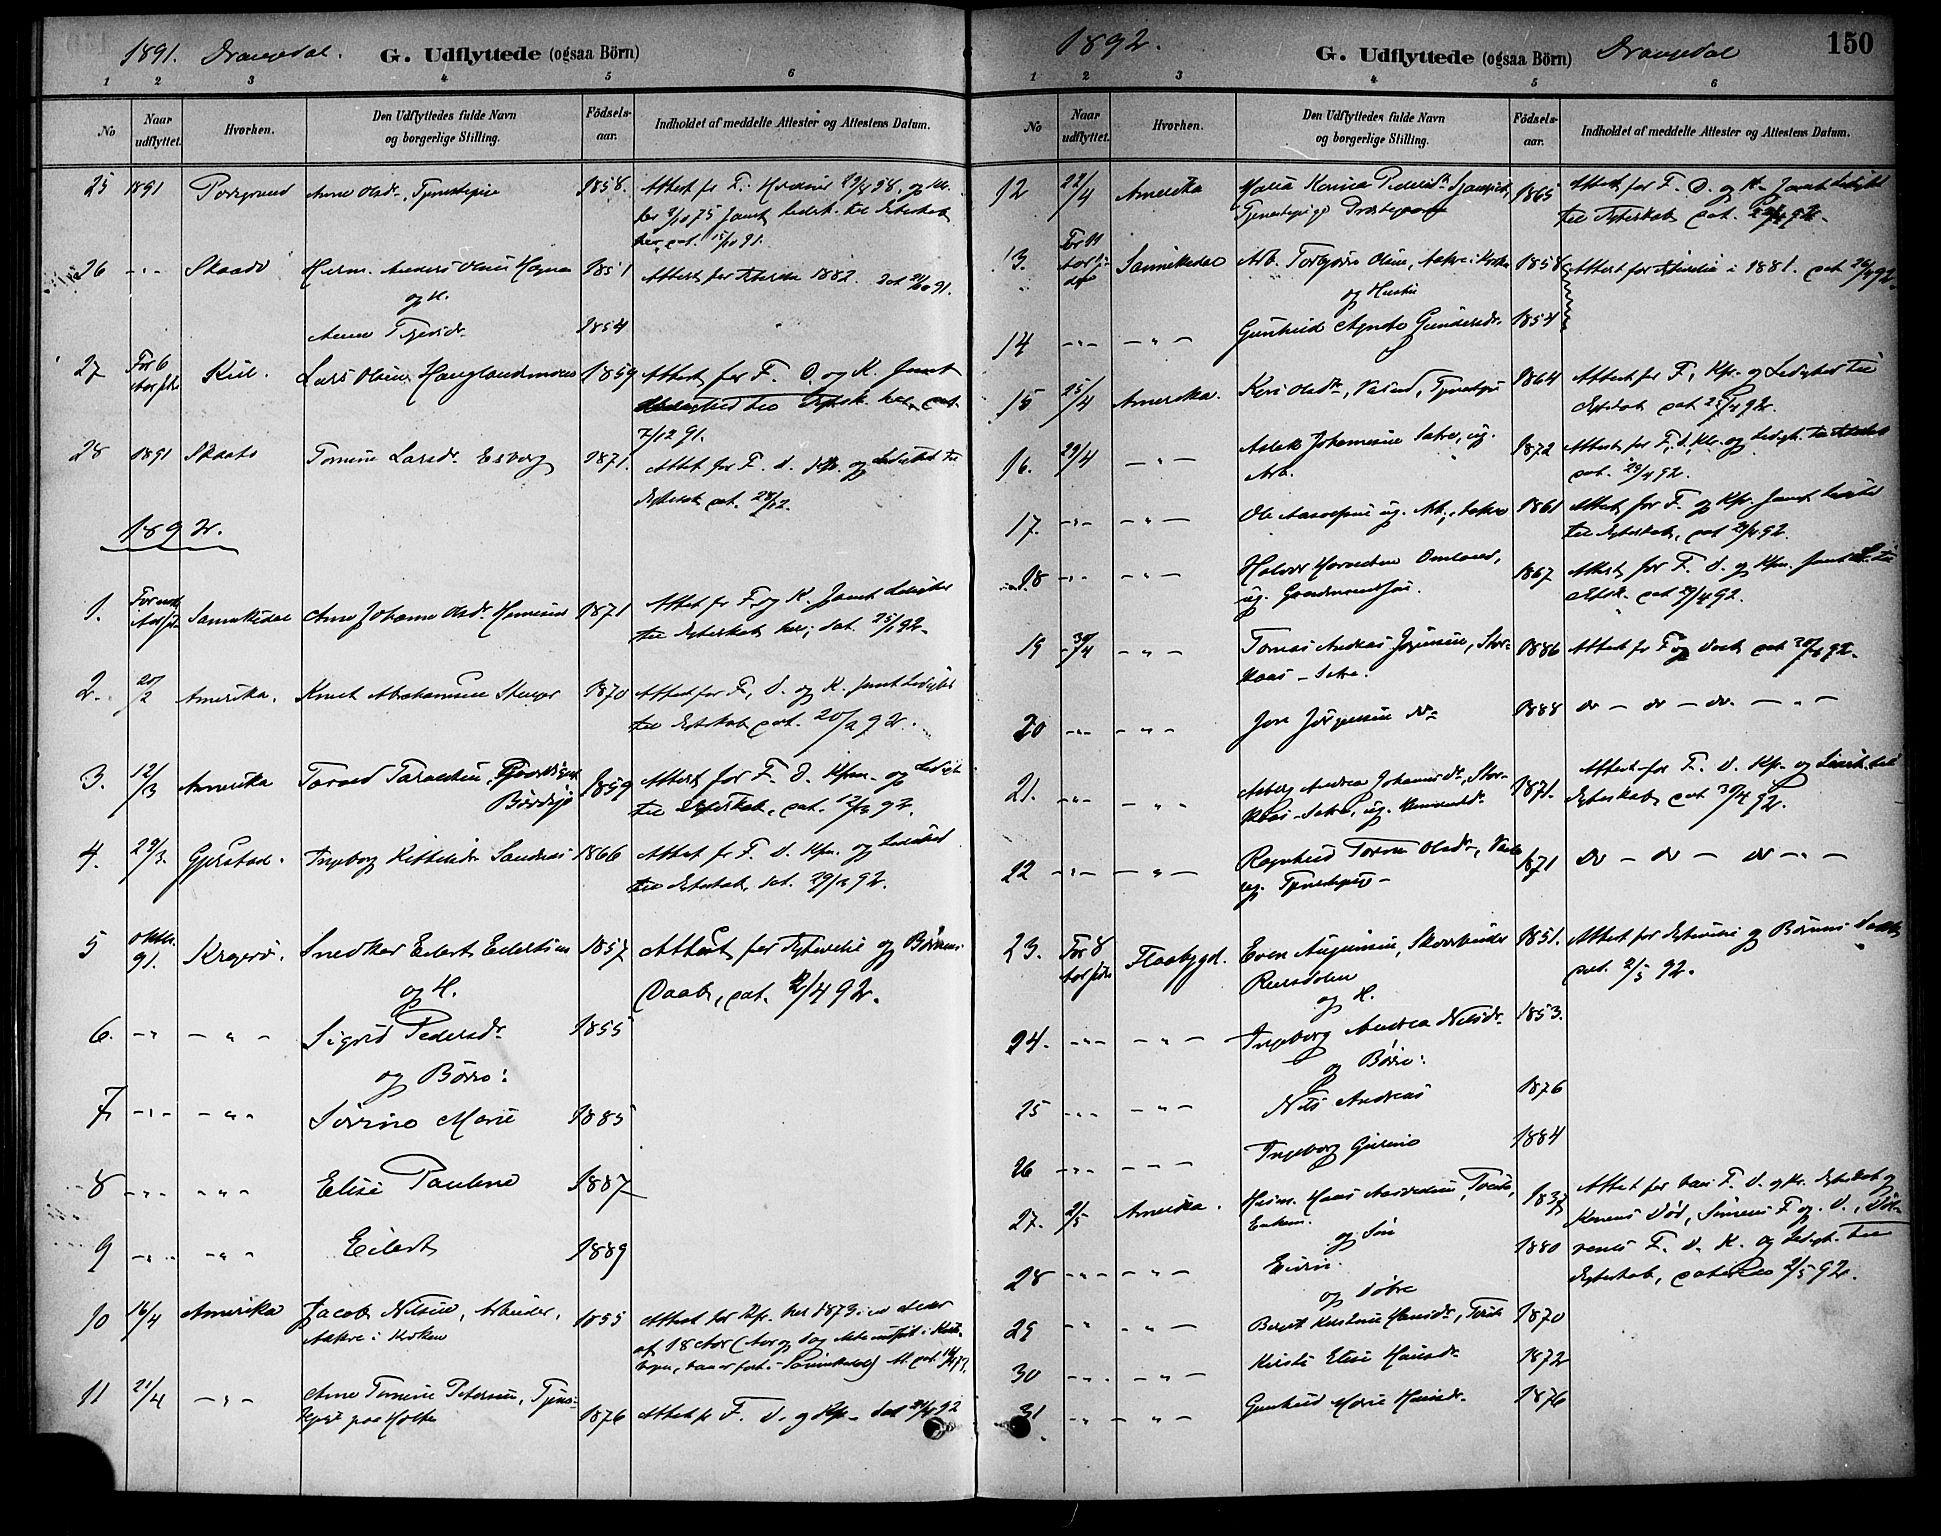 SAKO, Drangedal kirkebøker, F/Fa/L0011: Ministerialbok nr. 11 /1, 1885-1894, s. 150